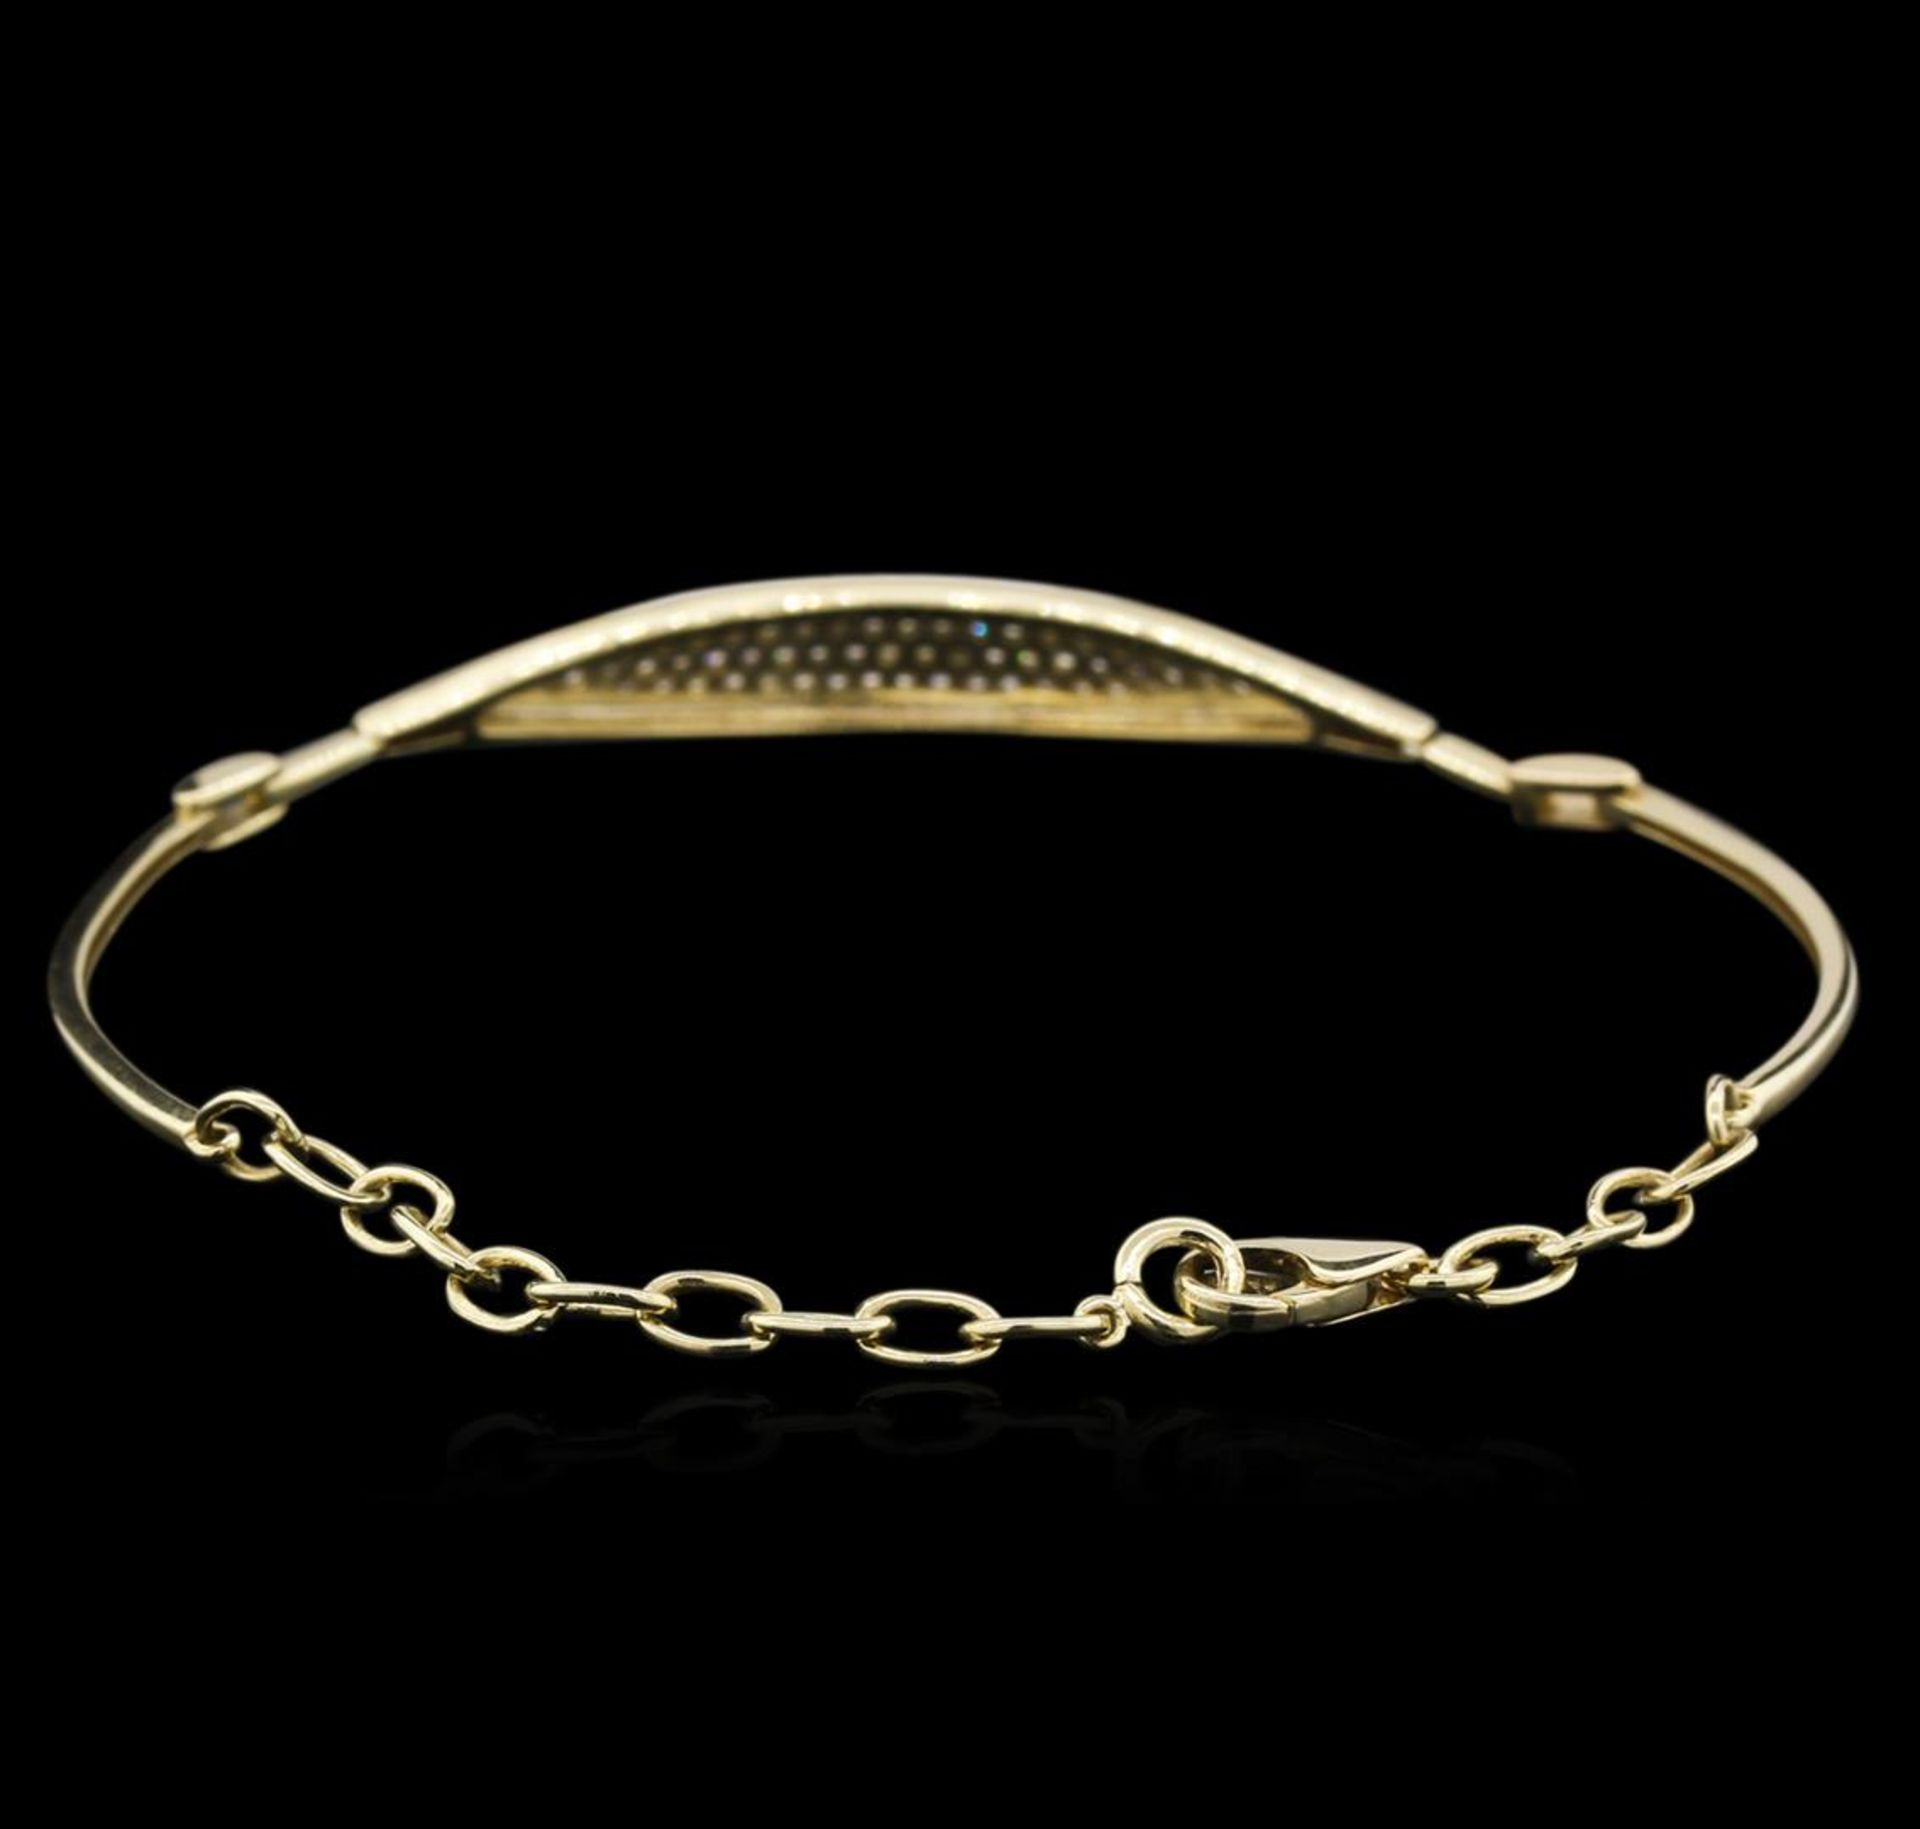 0.33 ctw Diamond Bracelet - 14KT Yellow Gold - Image 2 of 3